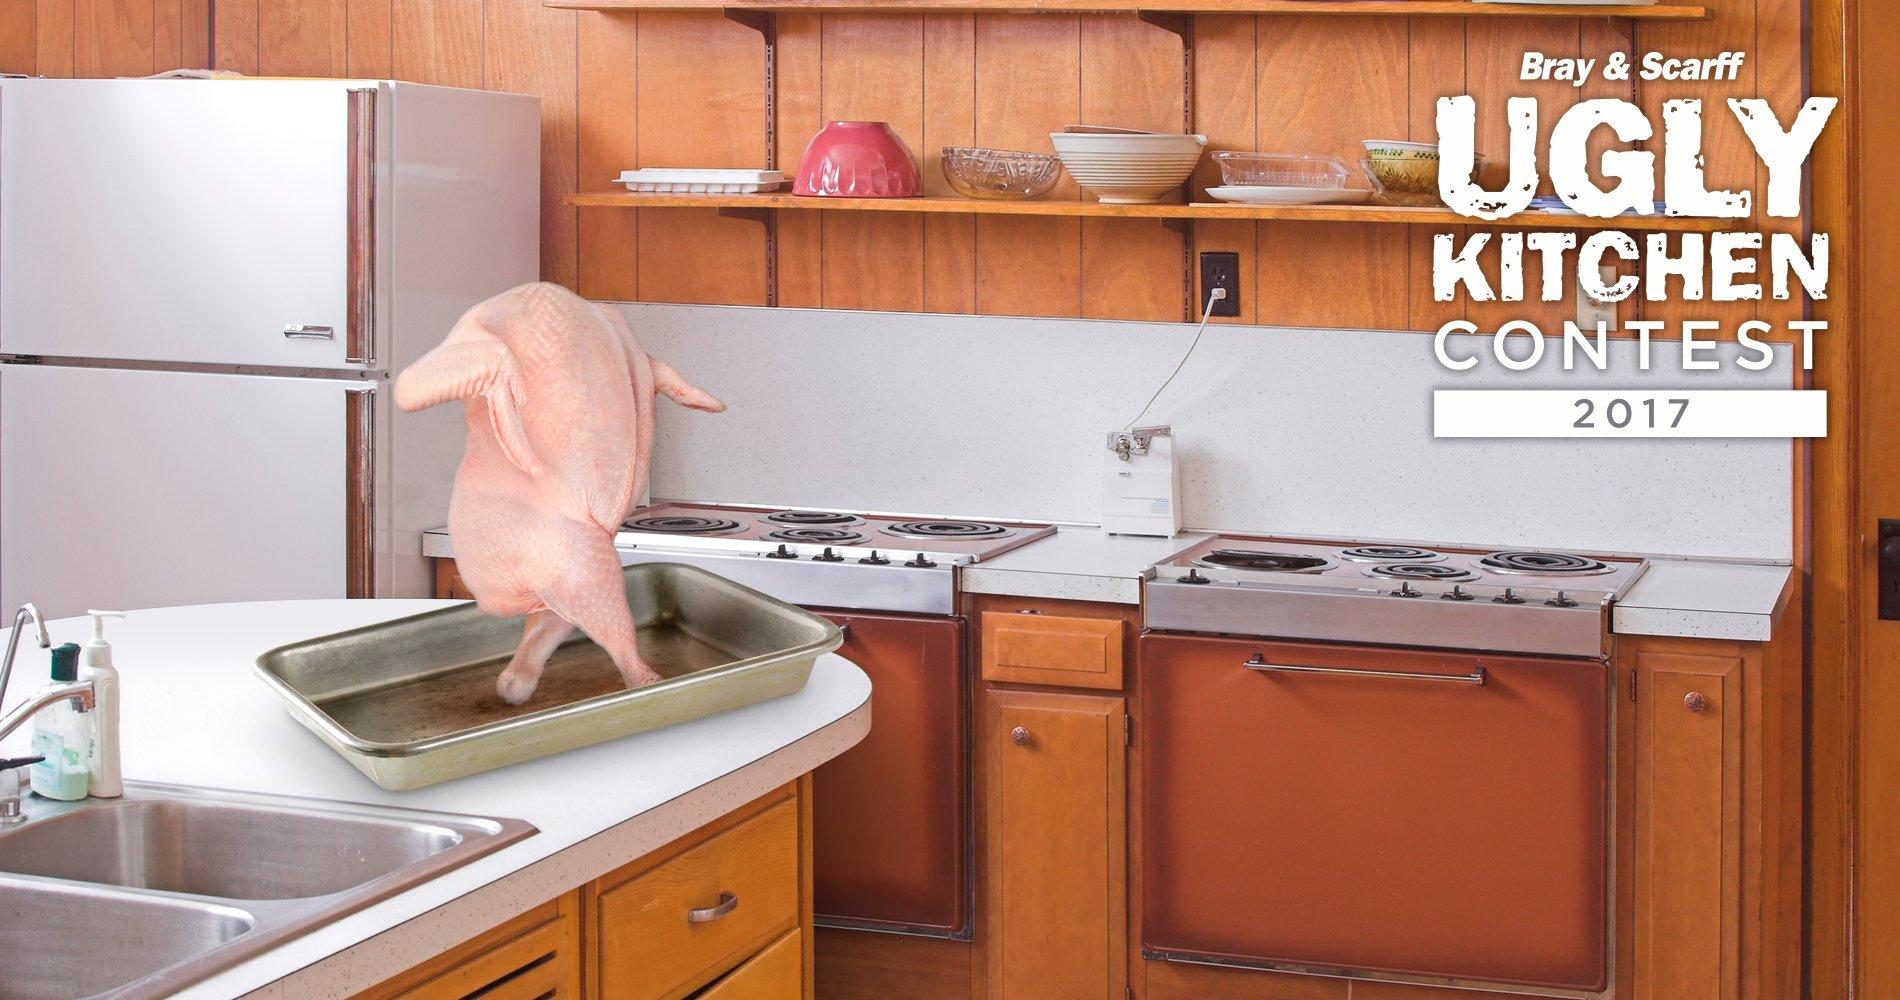 Ugly Kitchen - Bray & Scarff Appliance & Kitchen Specialists